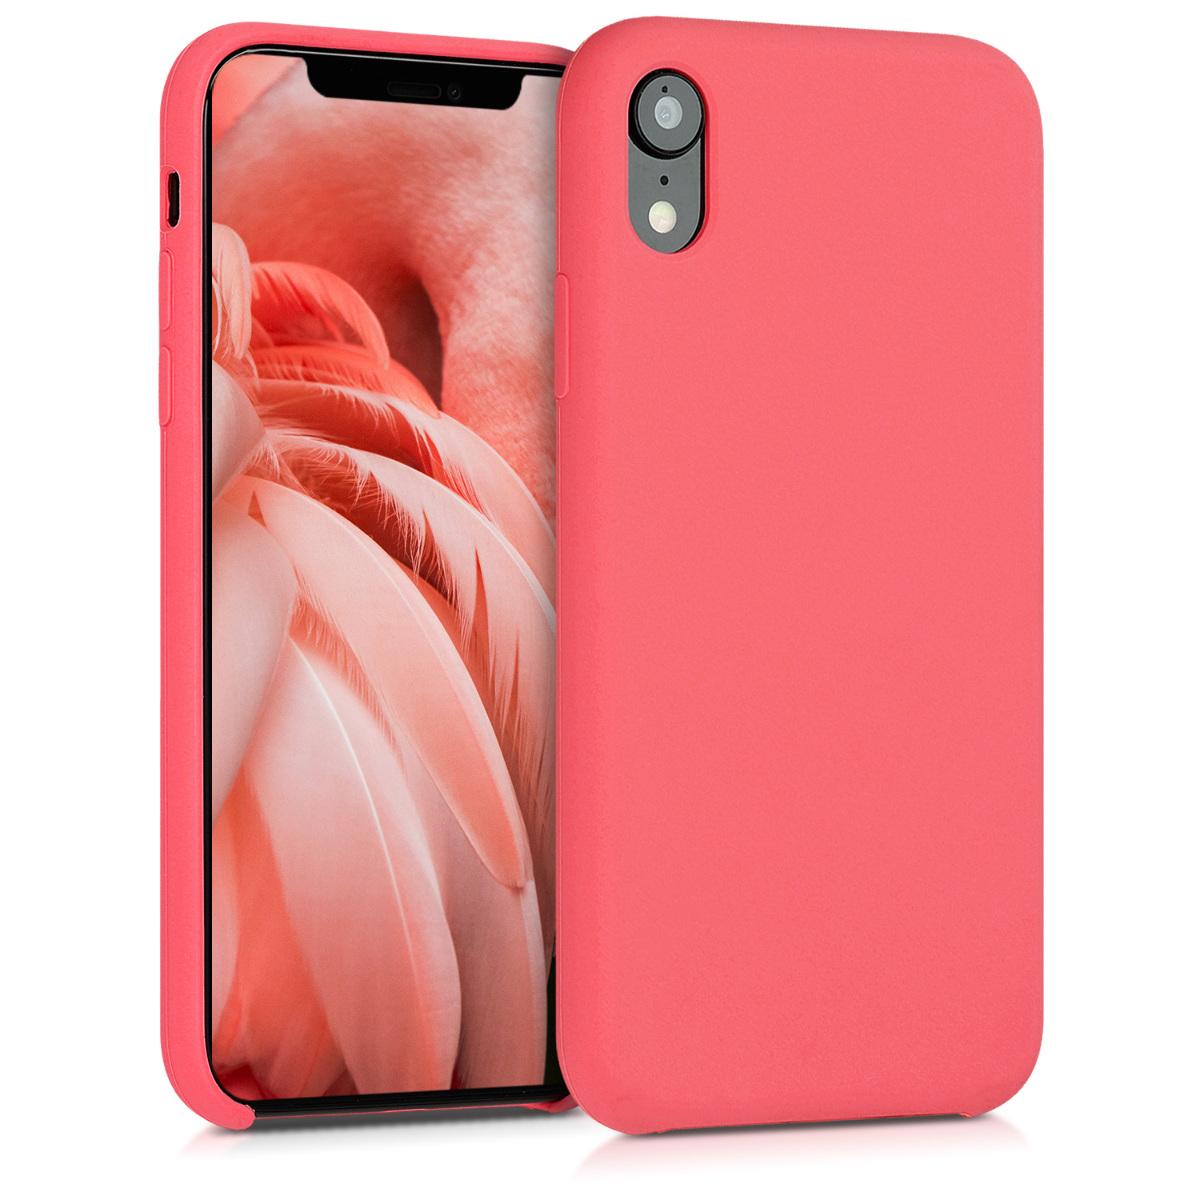 KW Soft Flexible Rubber Θήκη Σιλικόνης iPhone XR - Neon Κοραλί (45910.103)